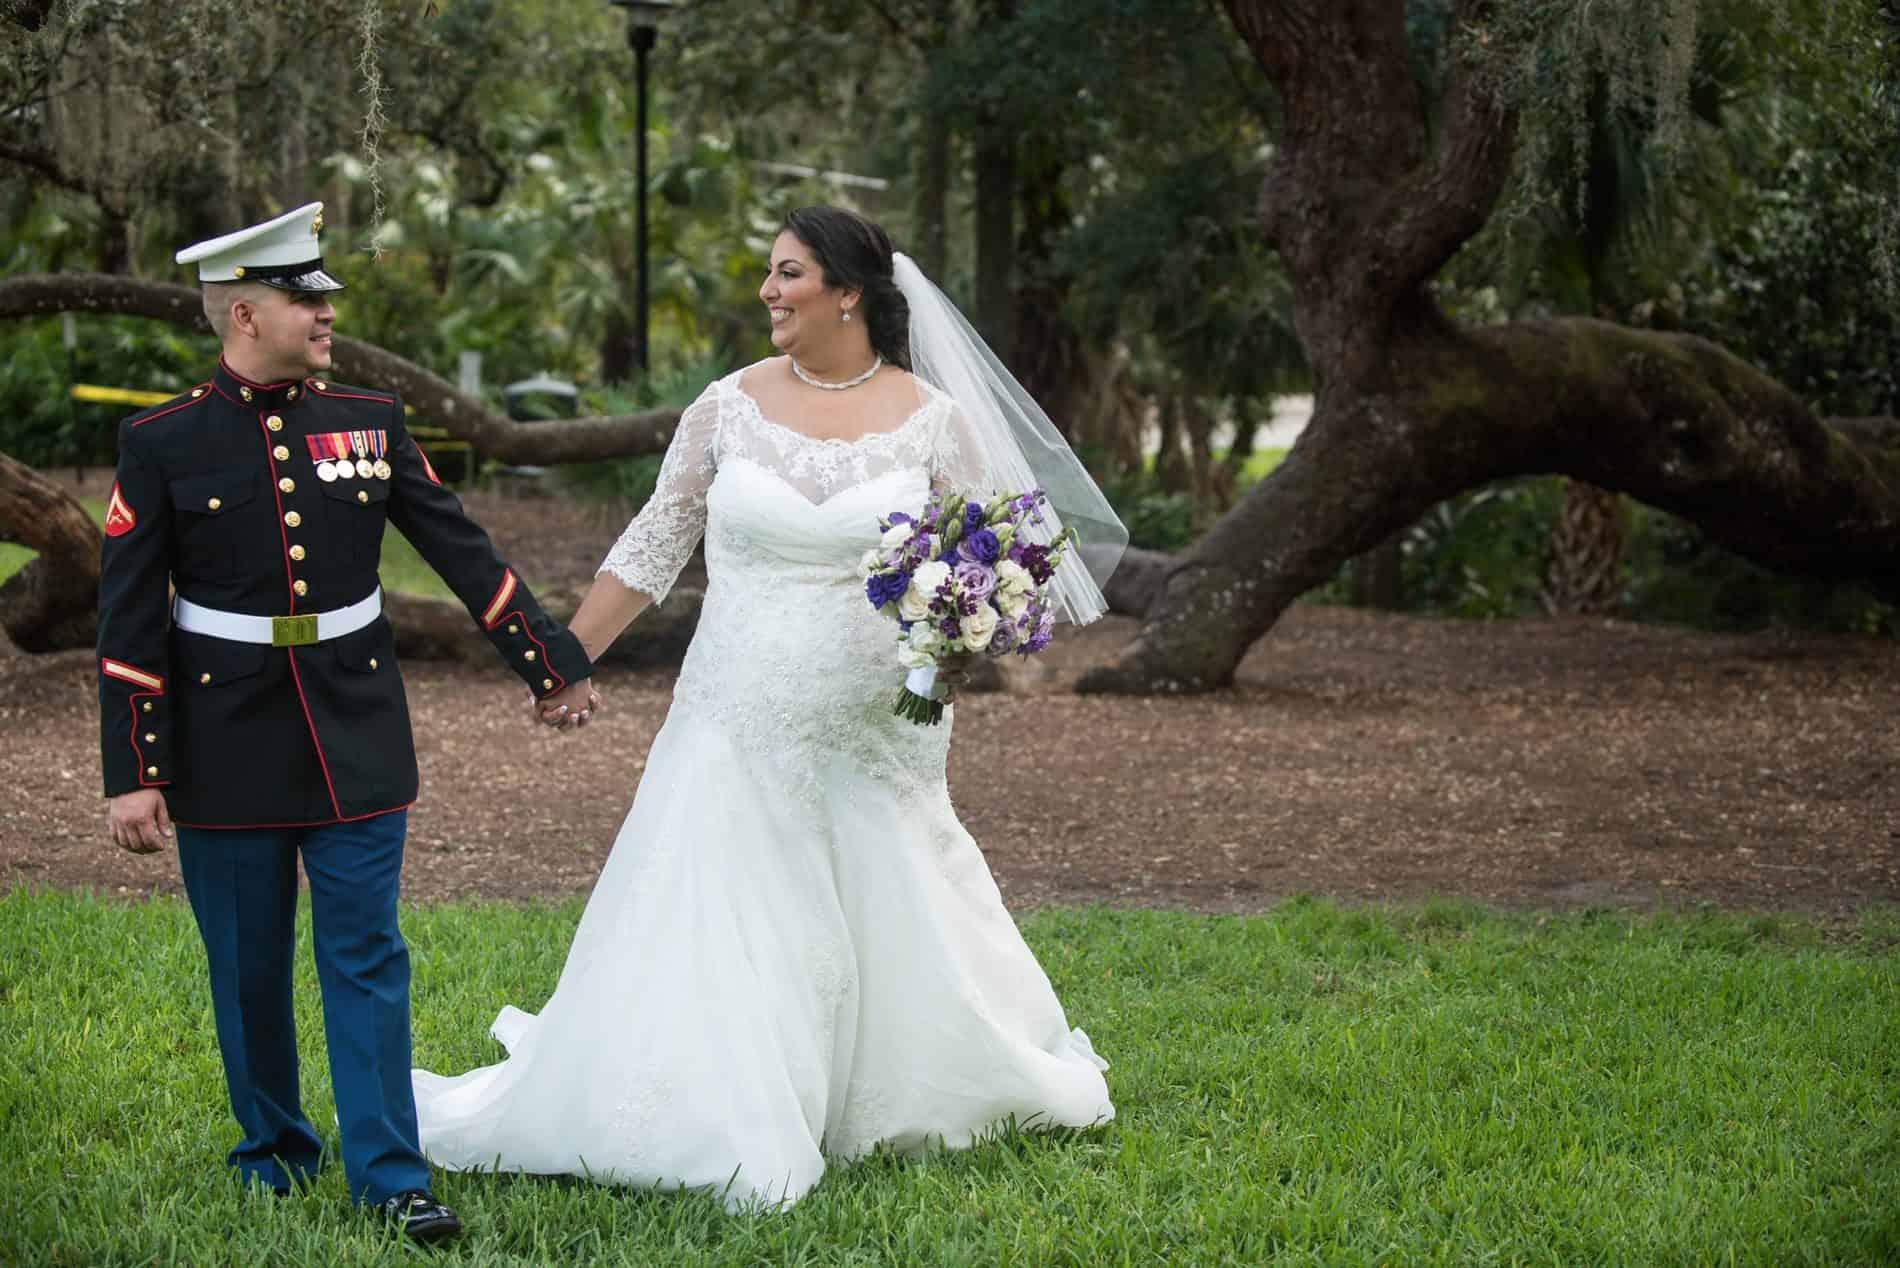 Downtown Orlando Couples Photo Session